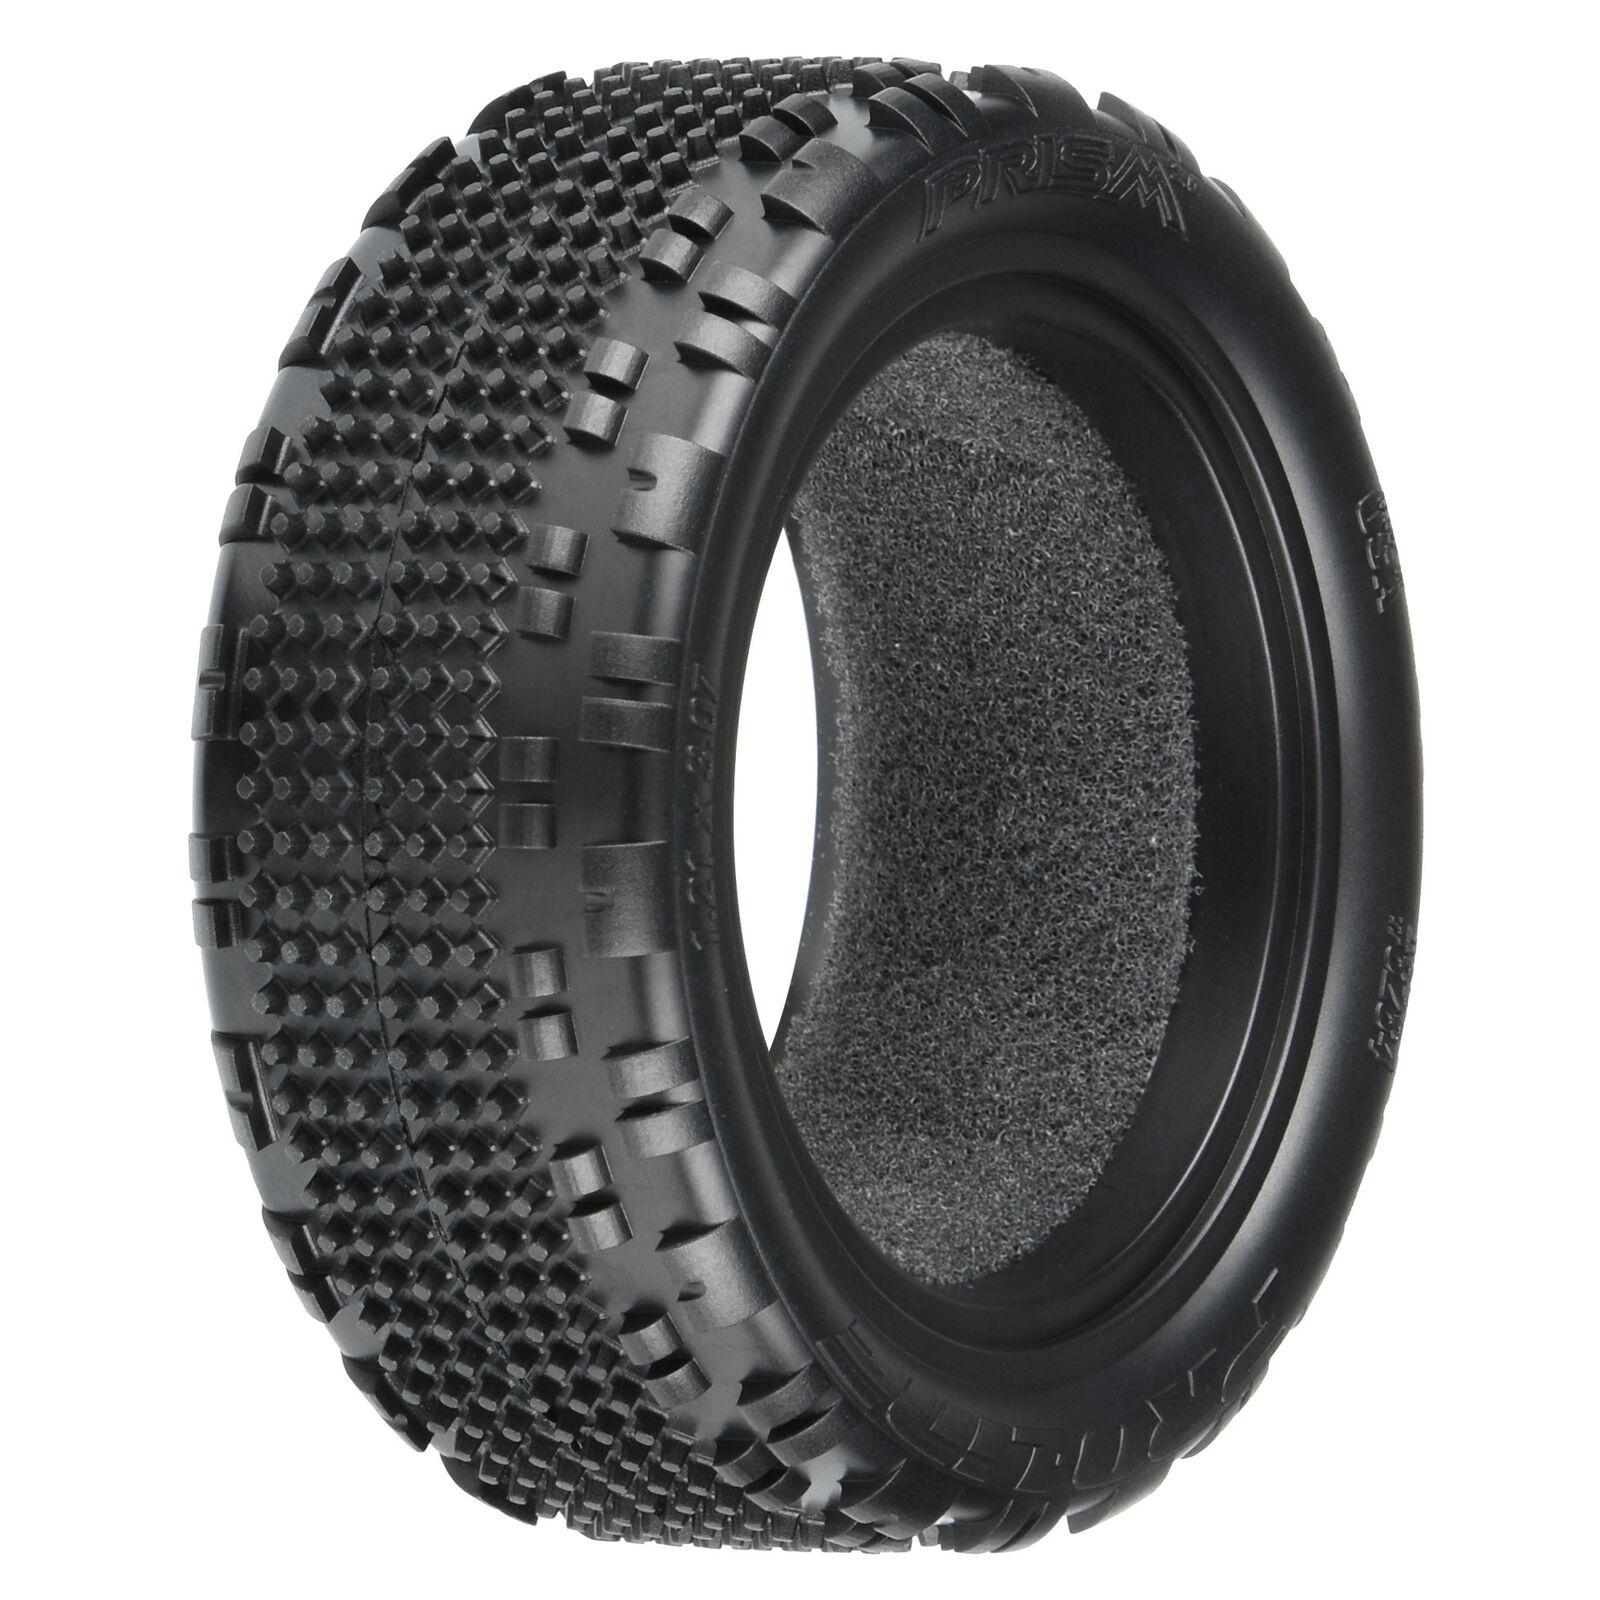 "1/10 Prism 2.0 Z4 4WD Front 2.2"" Carpet Buggy Tires (2)"